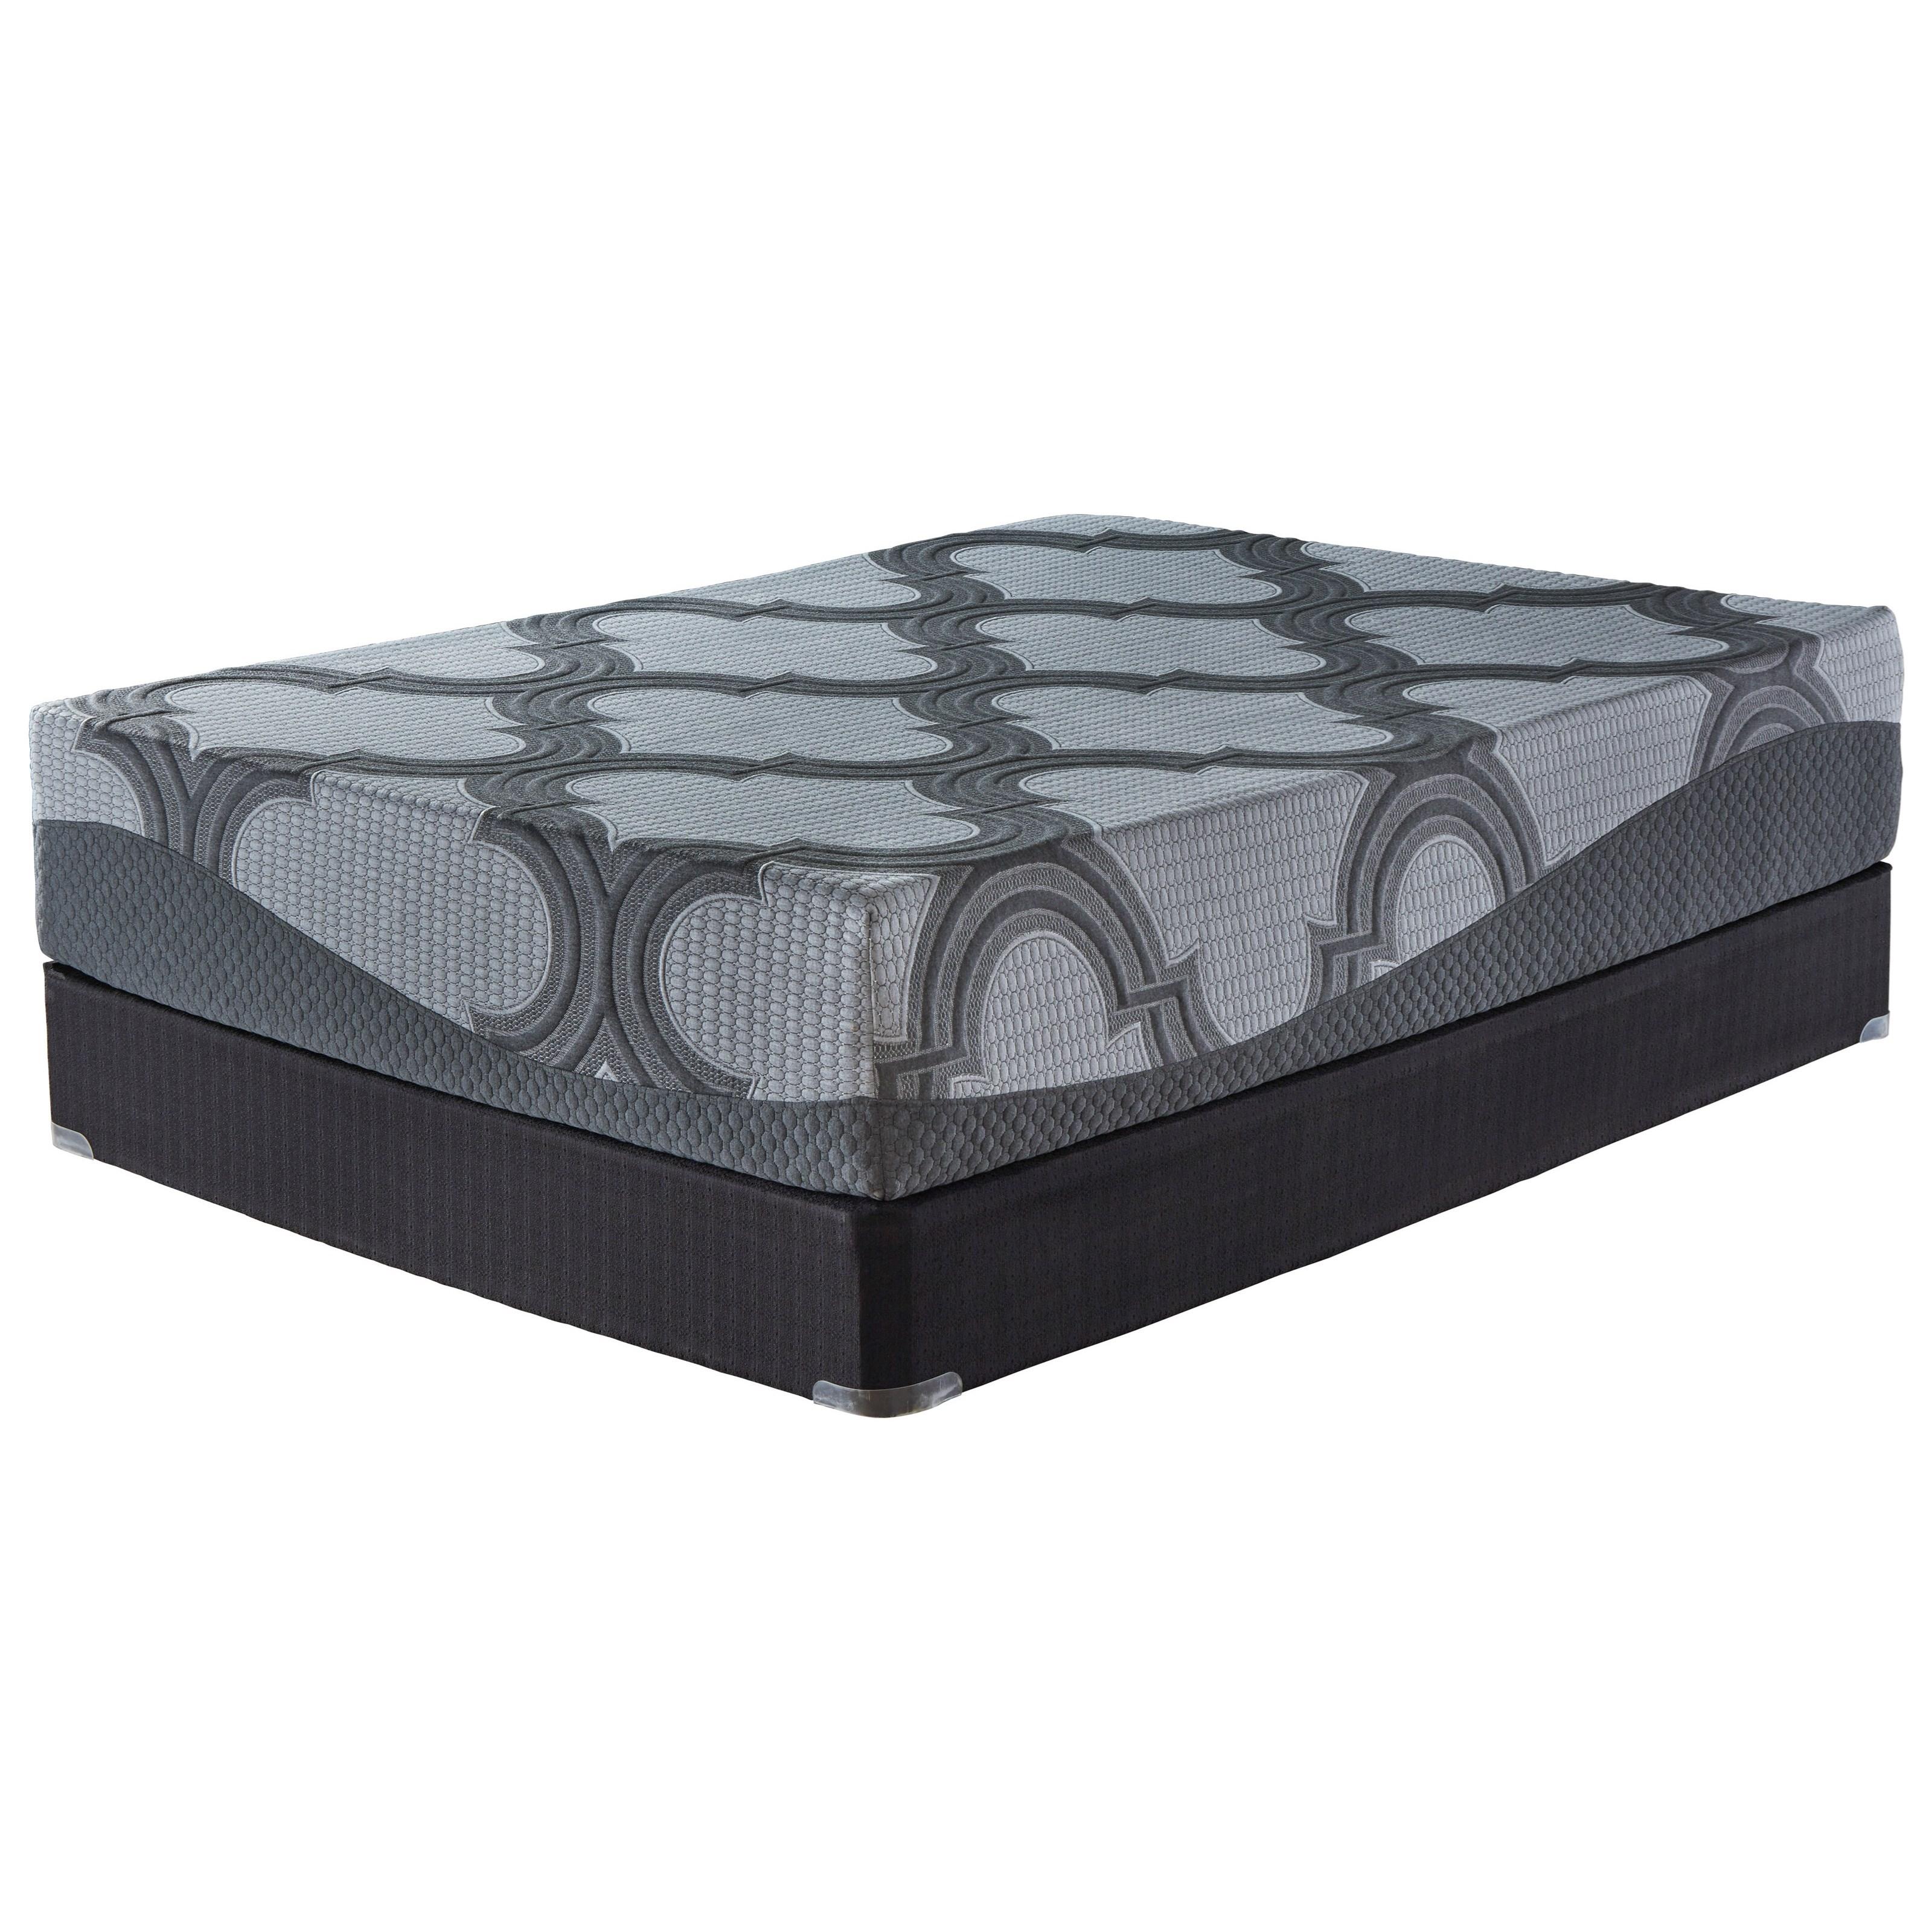 "M628 Cal King 12"" Firm Hybrid Mattress Set by Sierra Sleep at Suburban Furniture"